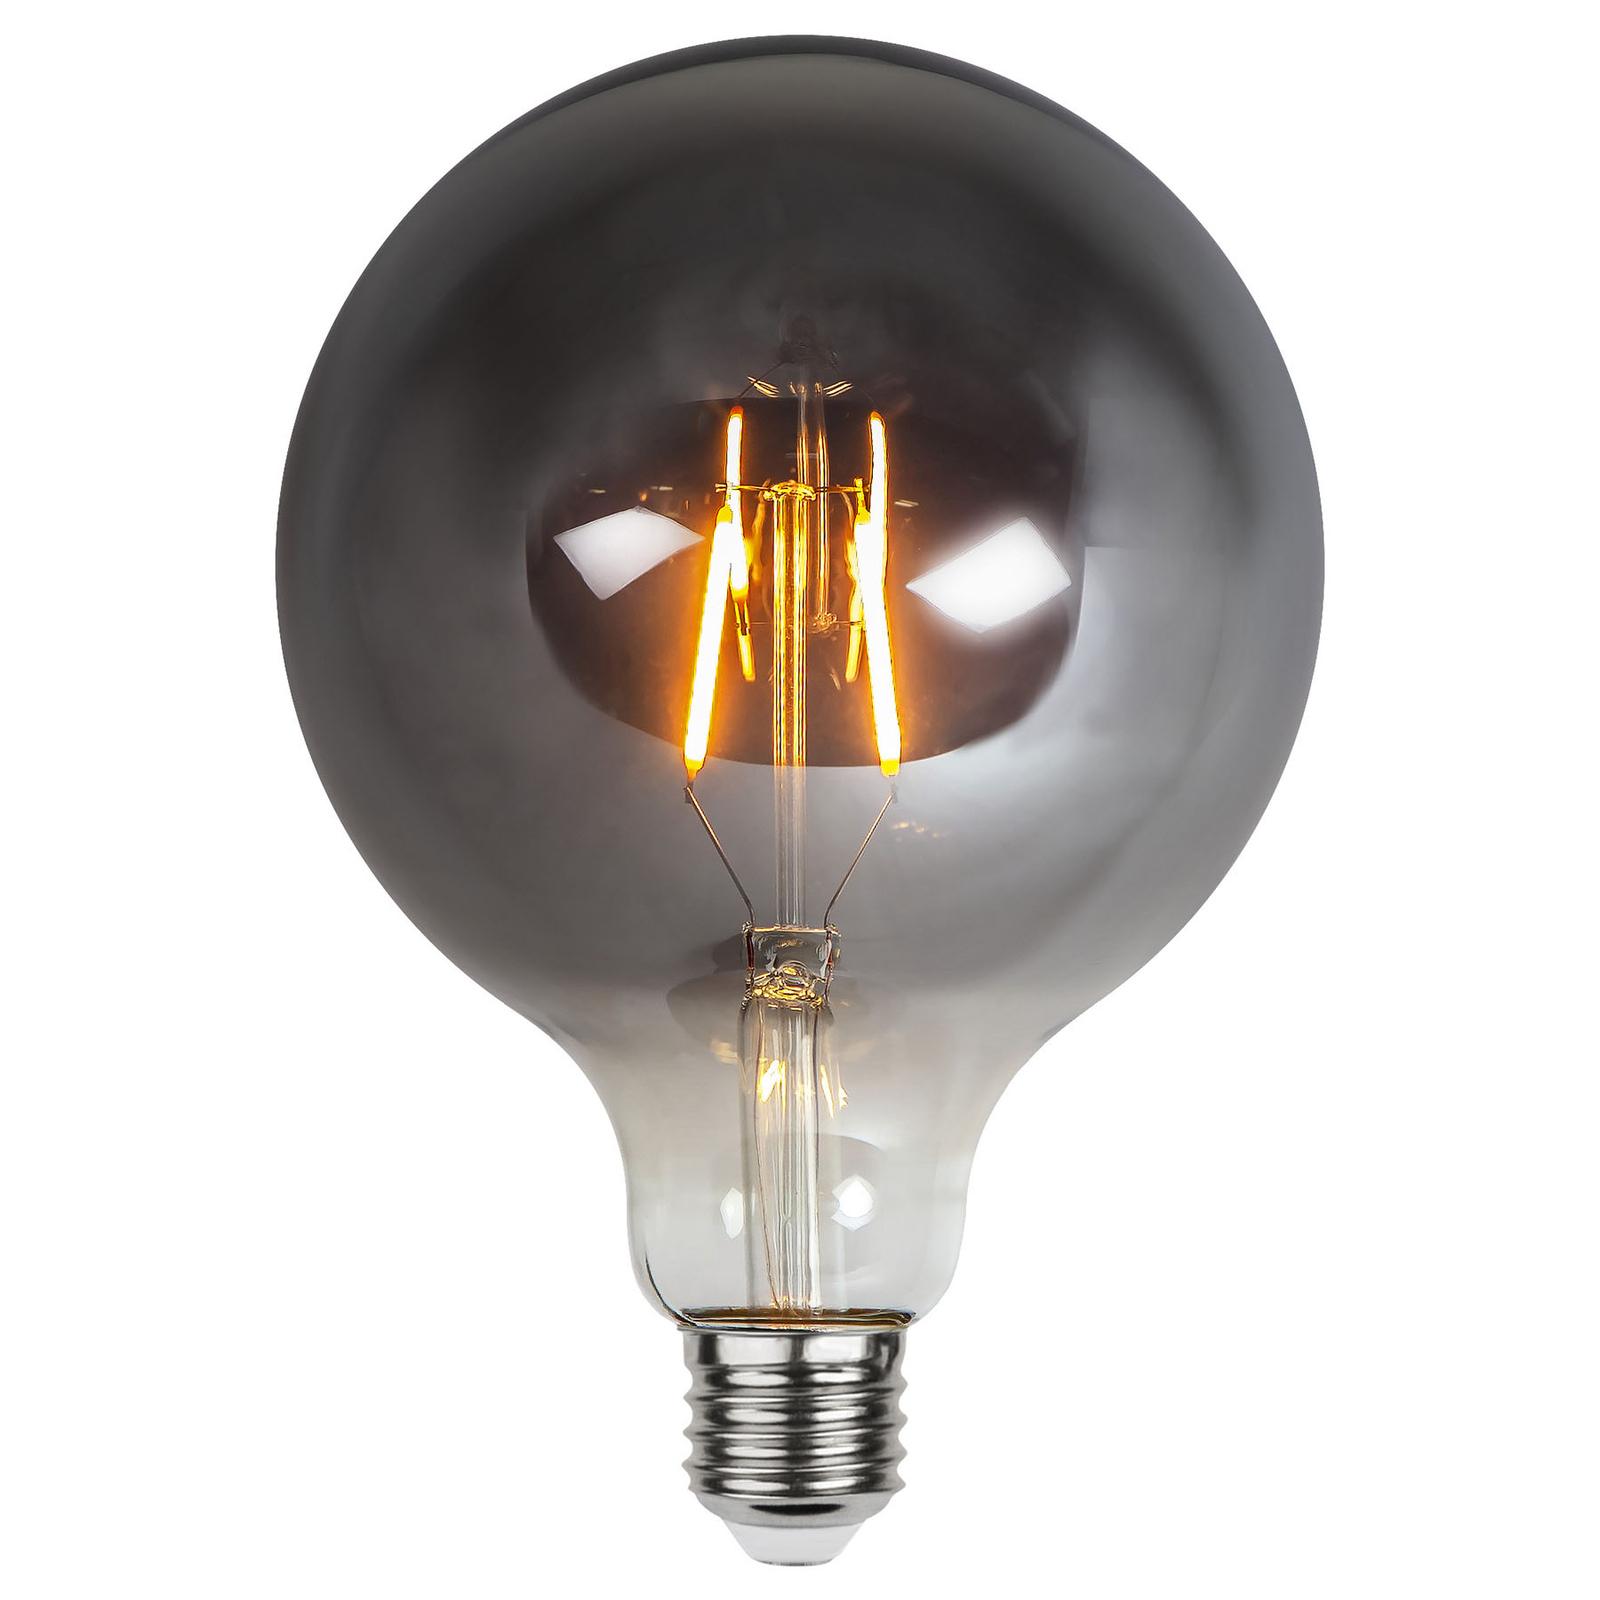 LED-Globelampe E27 1,8W Plain Smoke 2.100K Ø 125mm